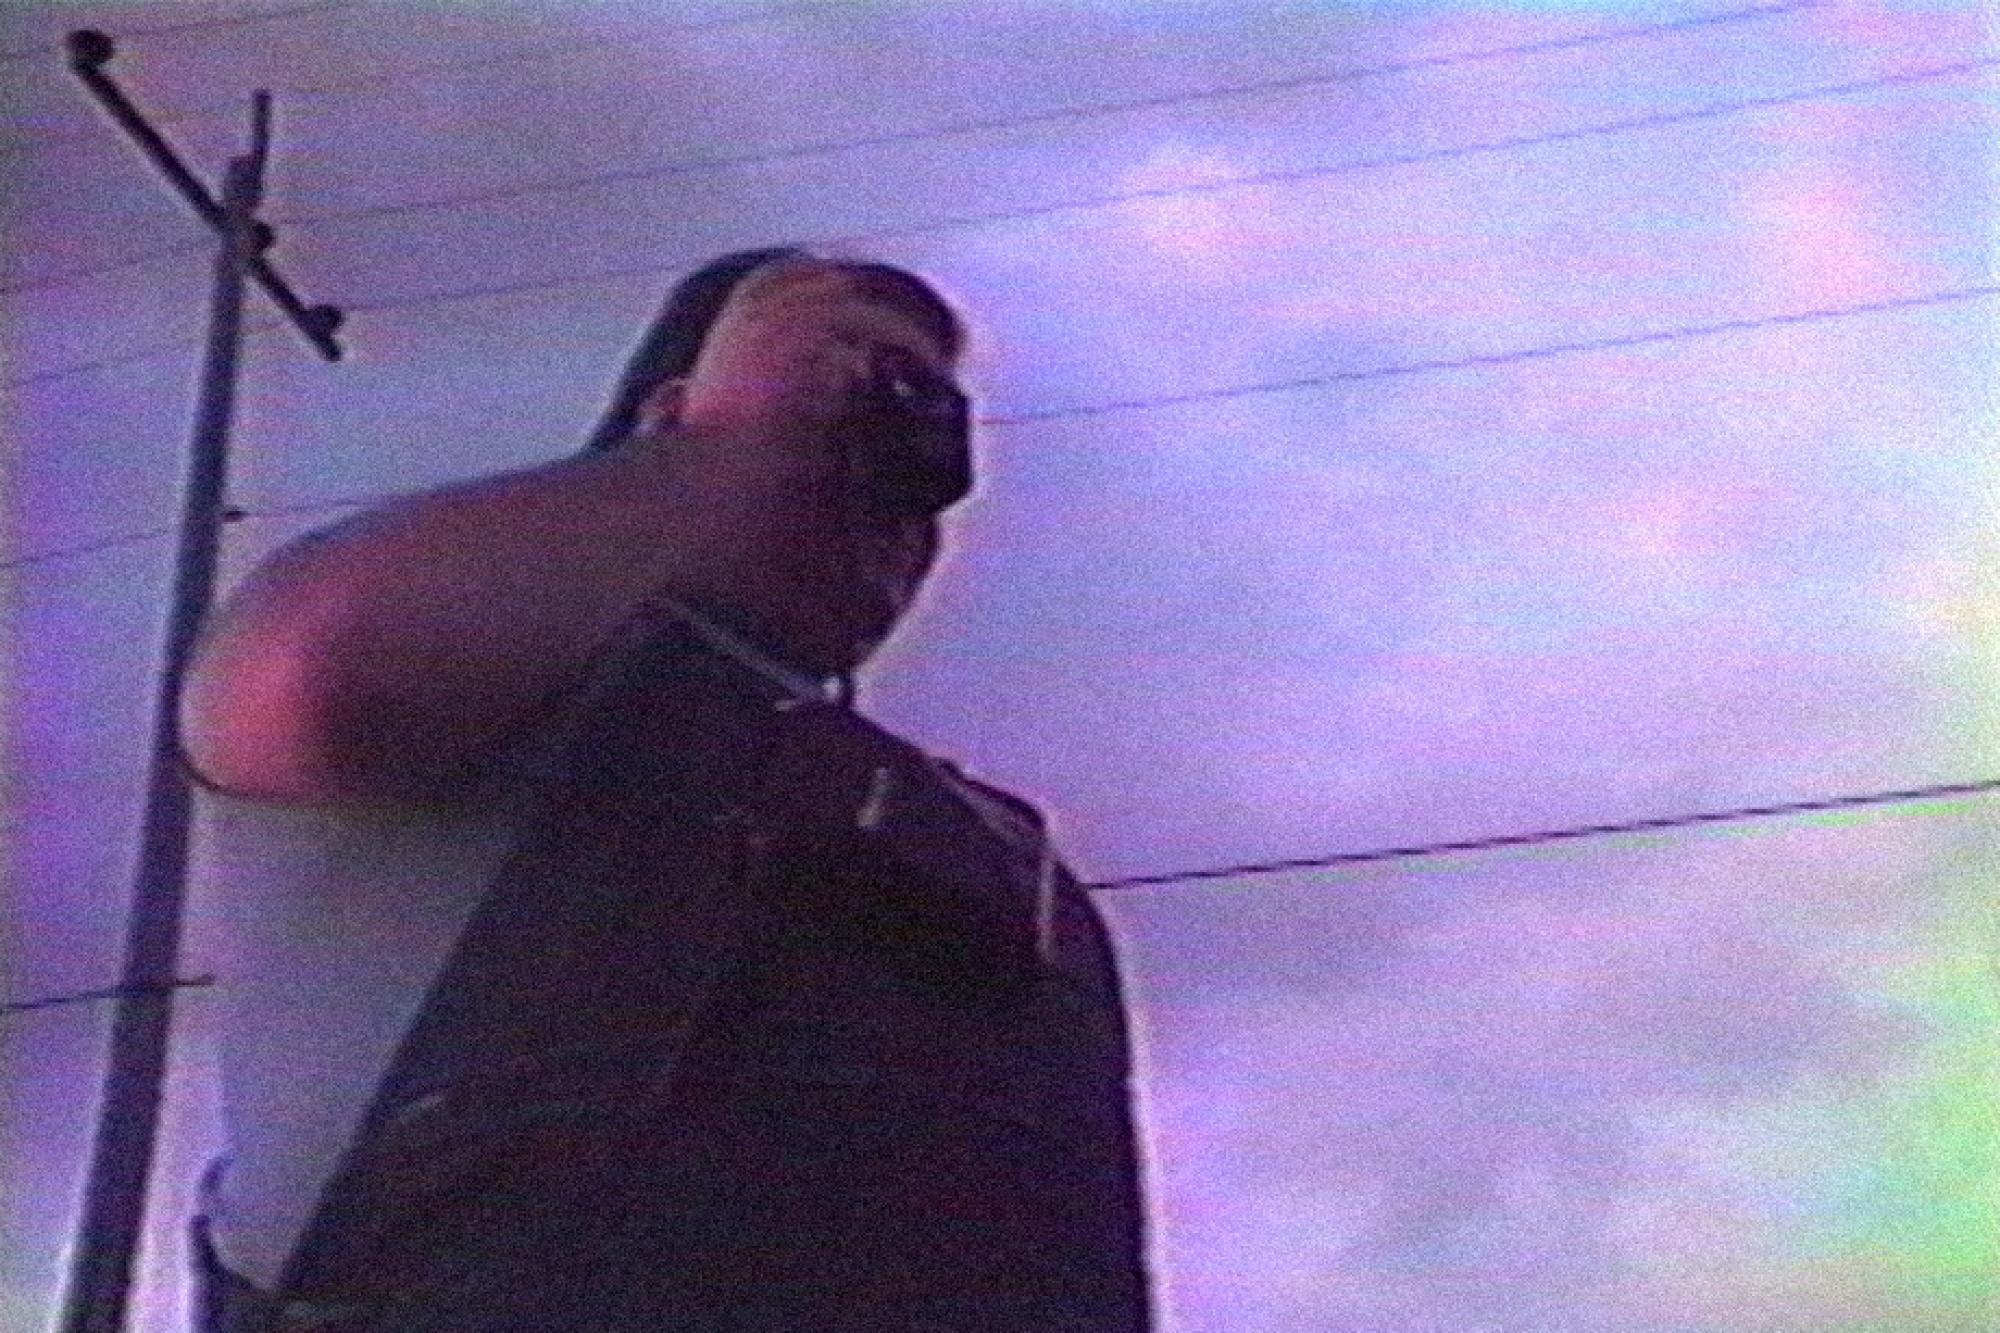 [ Fig. 07 ] <i>Le voyage de l'ogre / The Path of the Ogre</i> (video still), 1981.